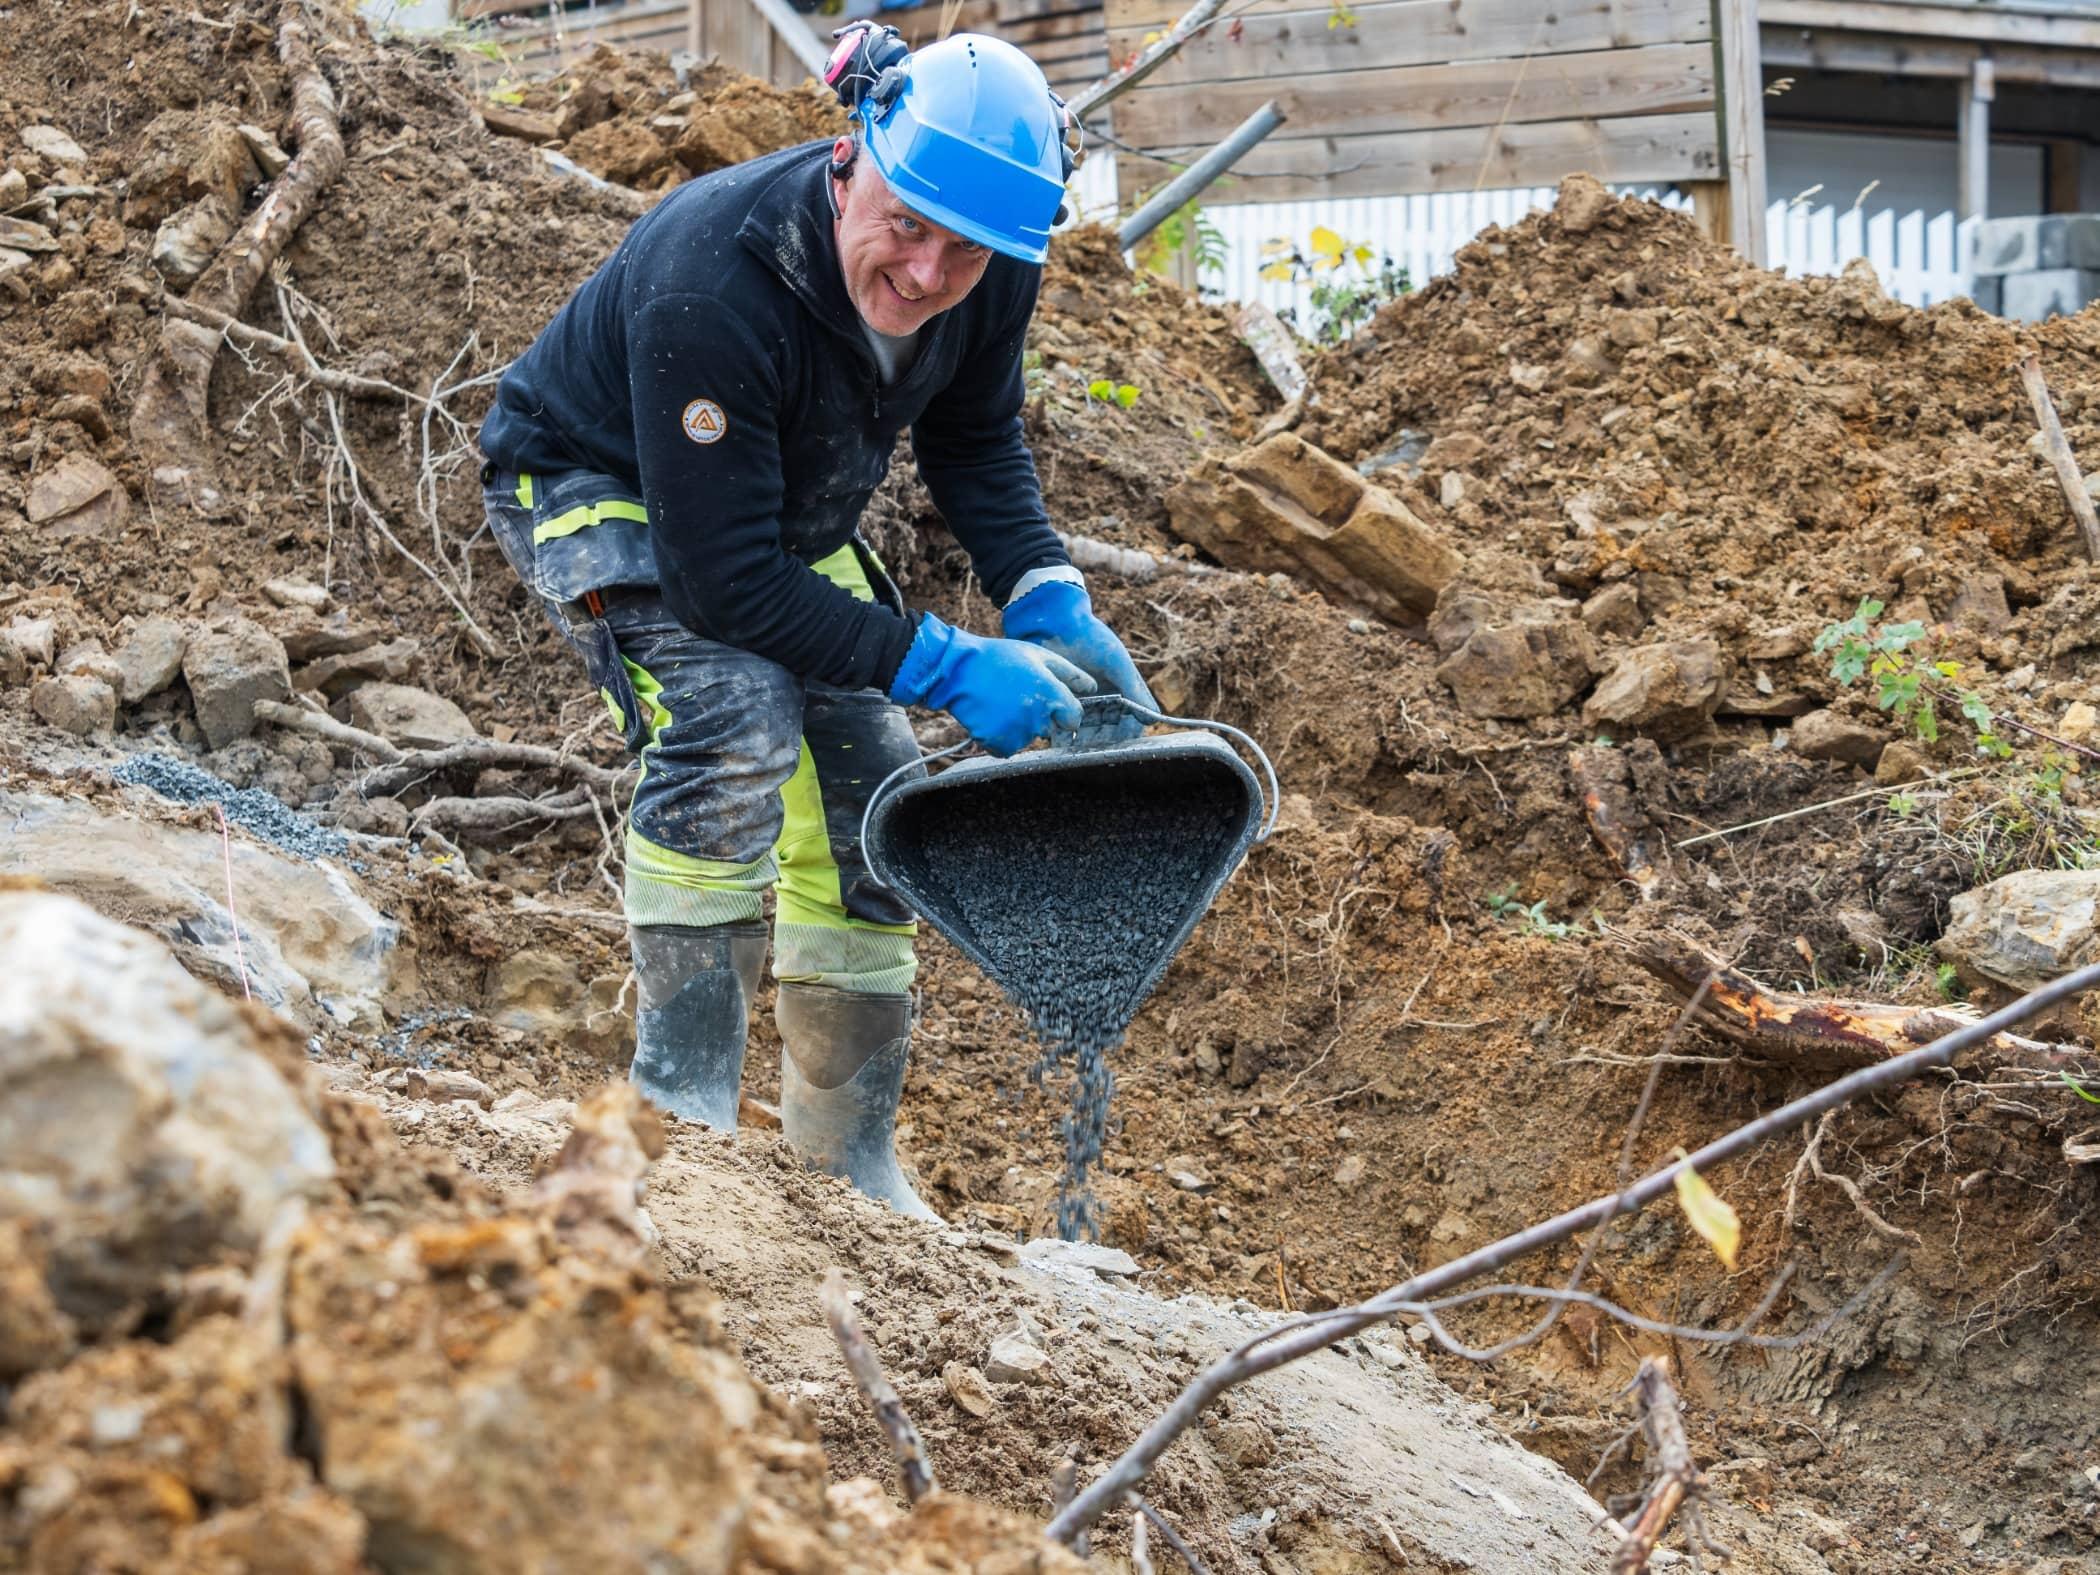 Blue-collar worker, Soil